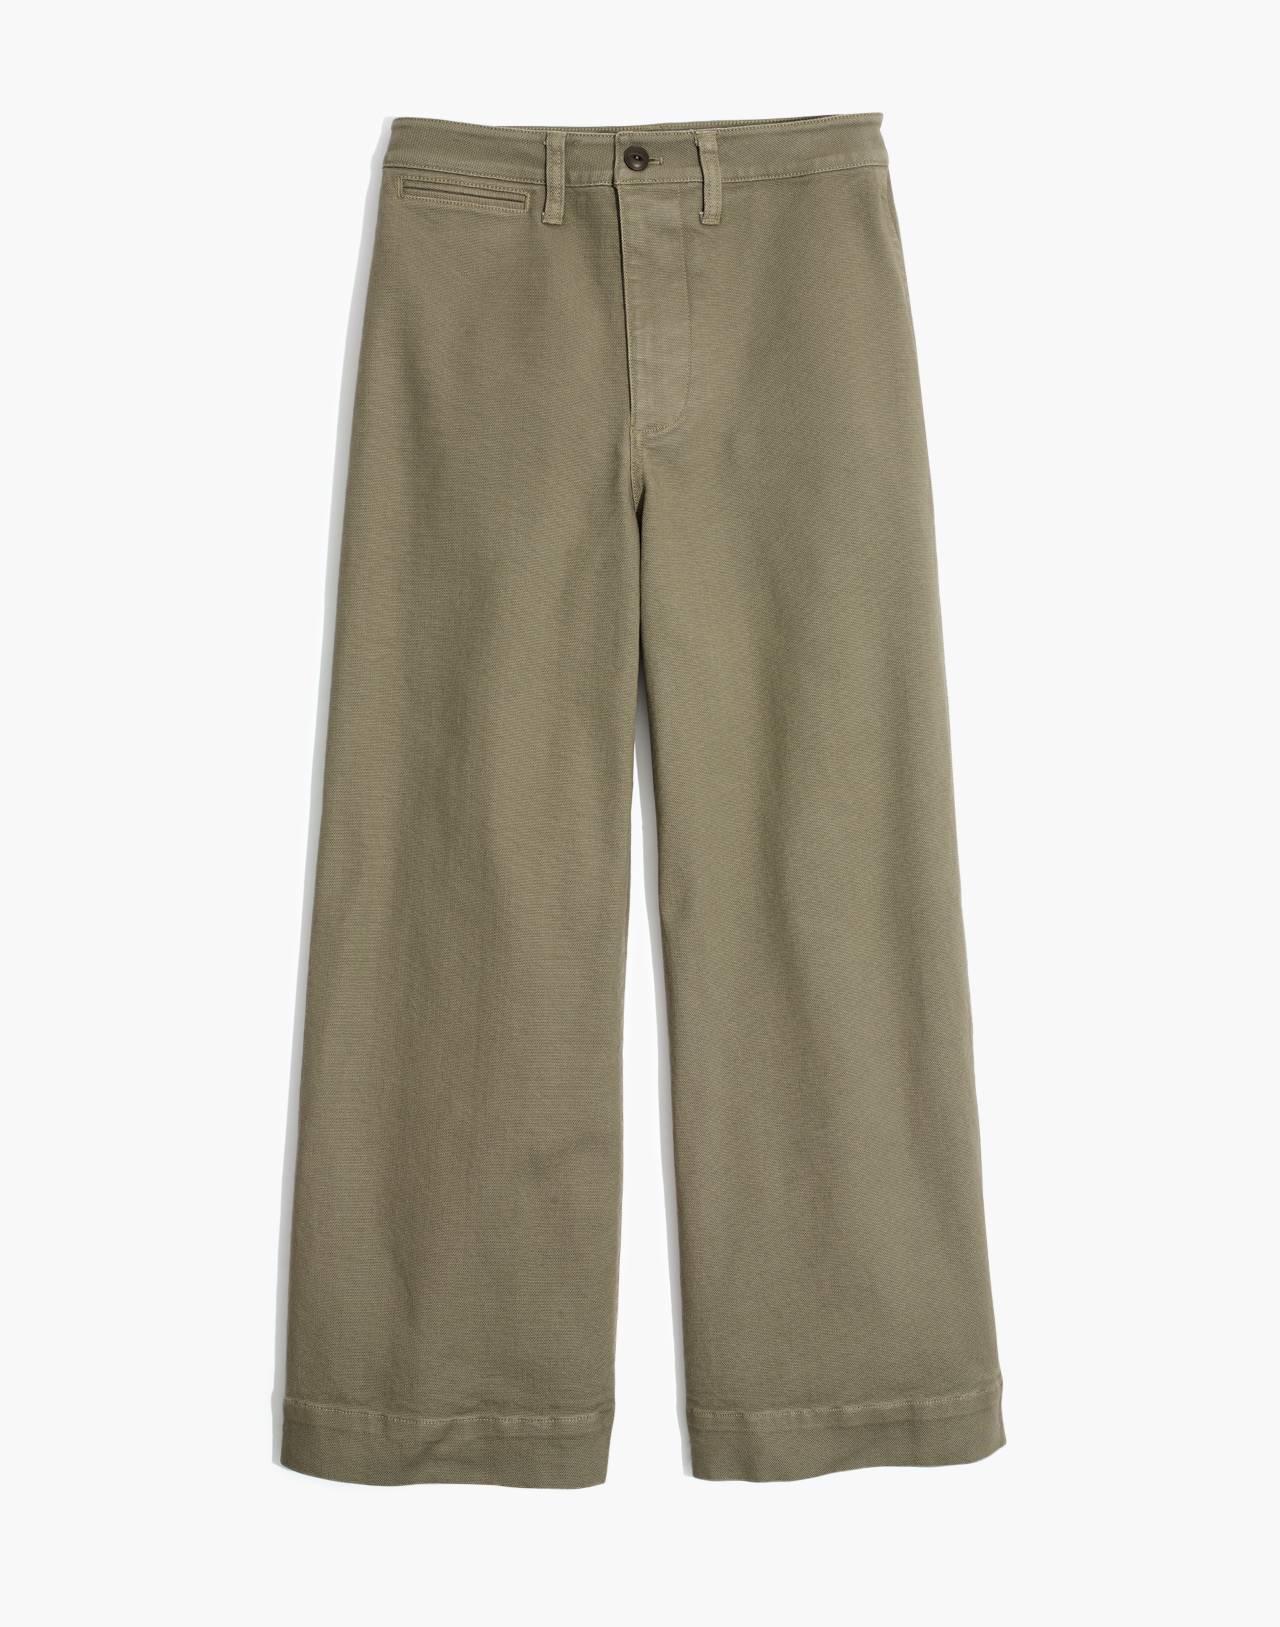 Emmett Wide-Leg Crop Pants in british surplus image 4